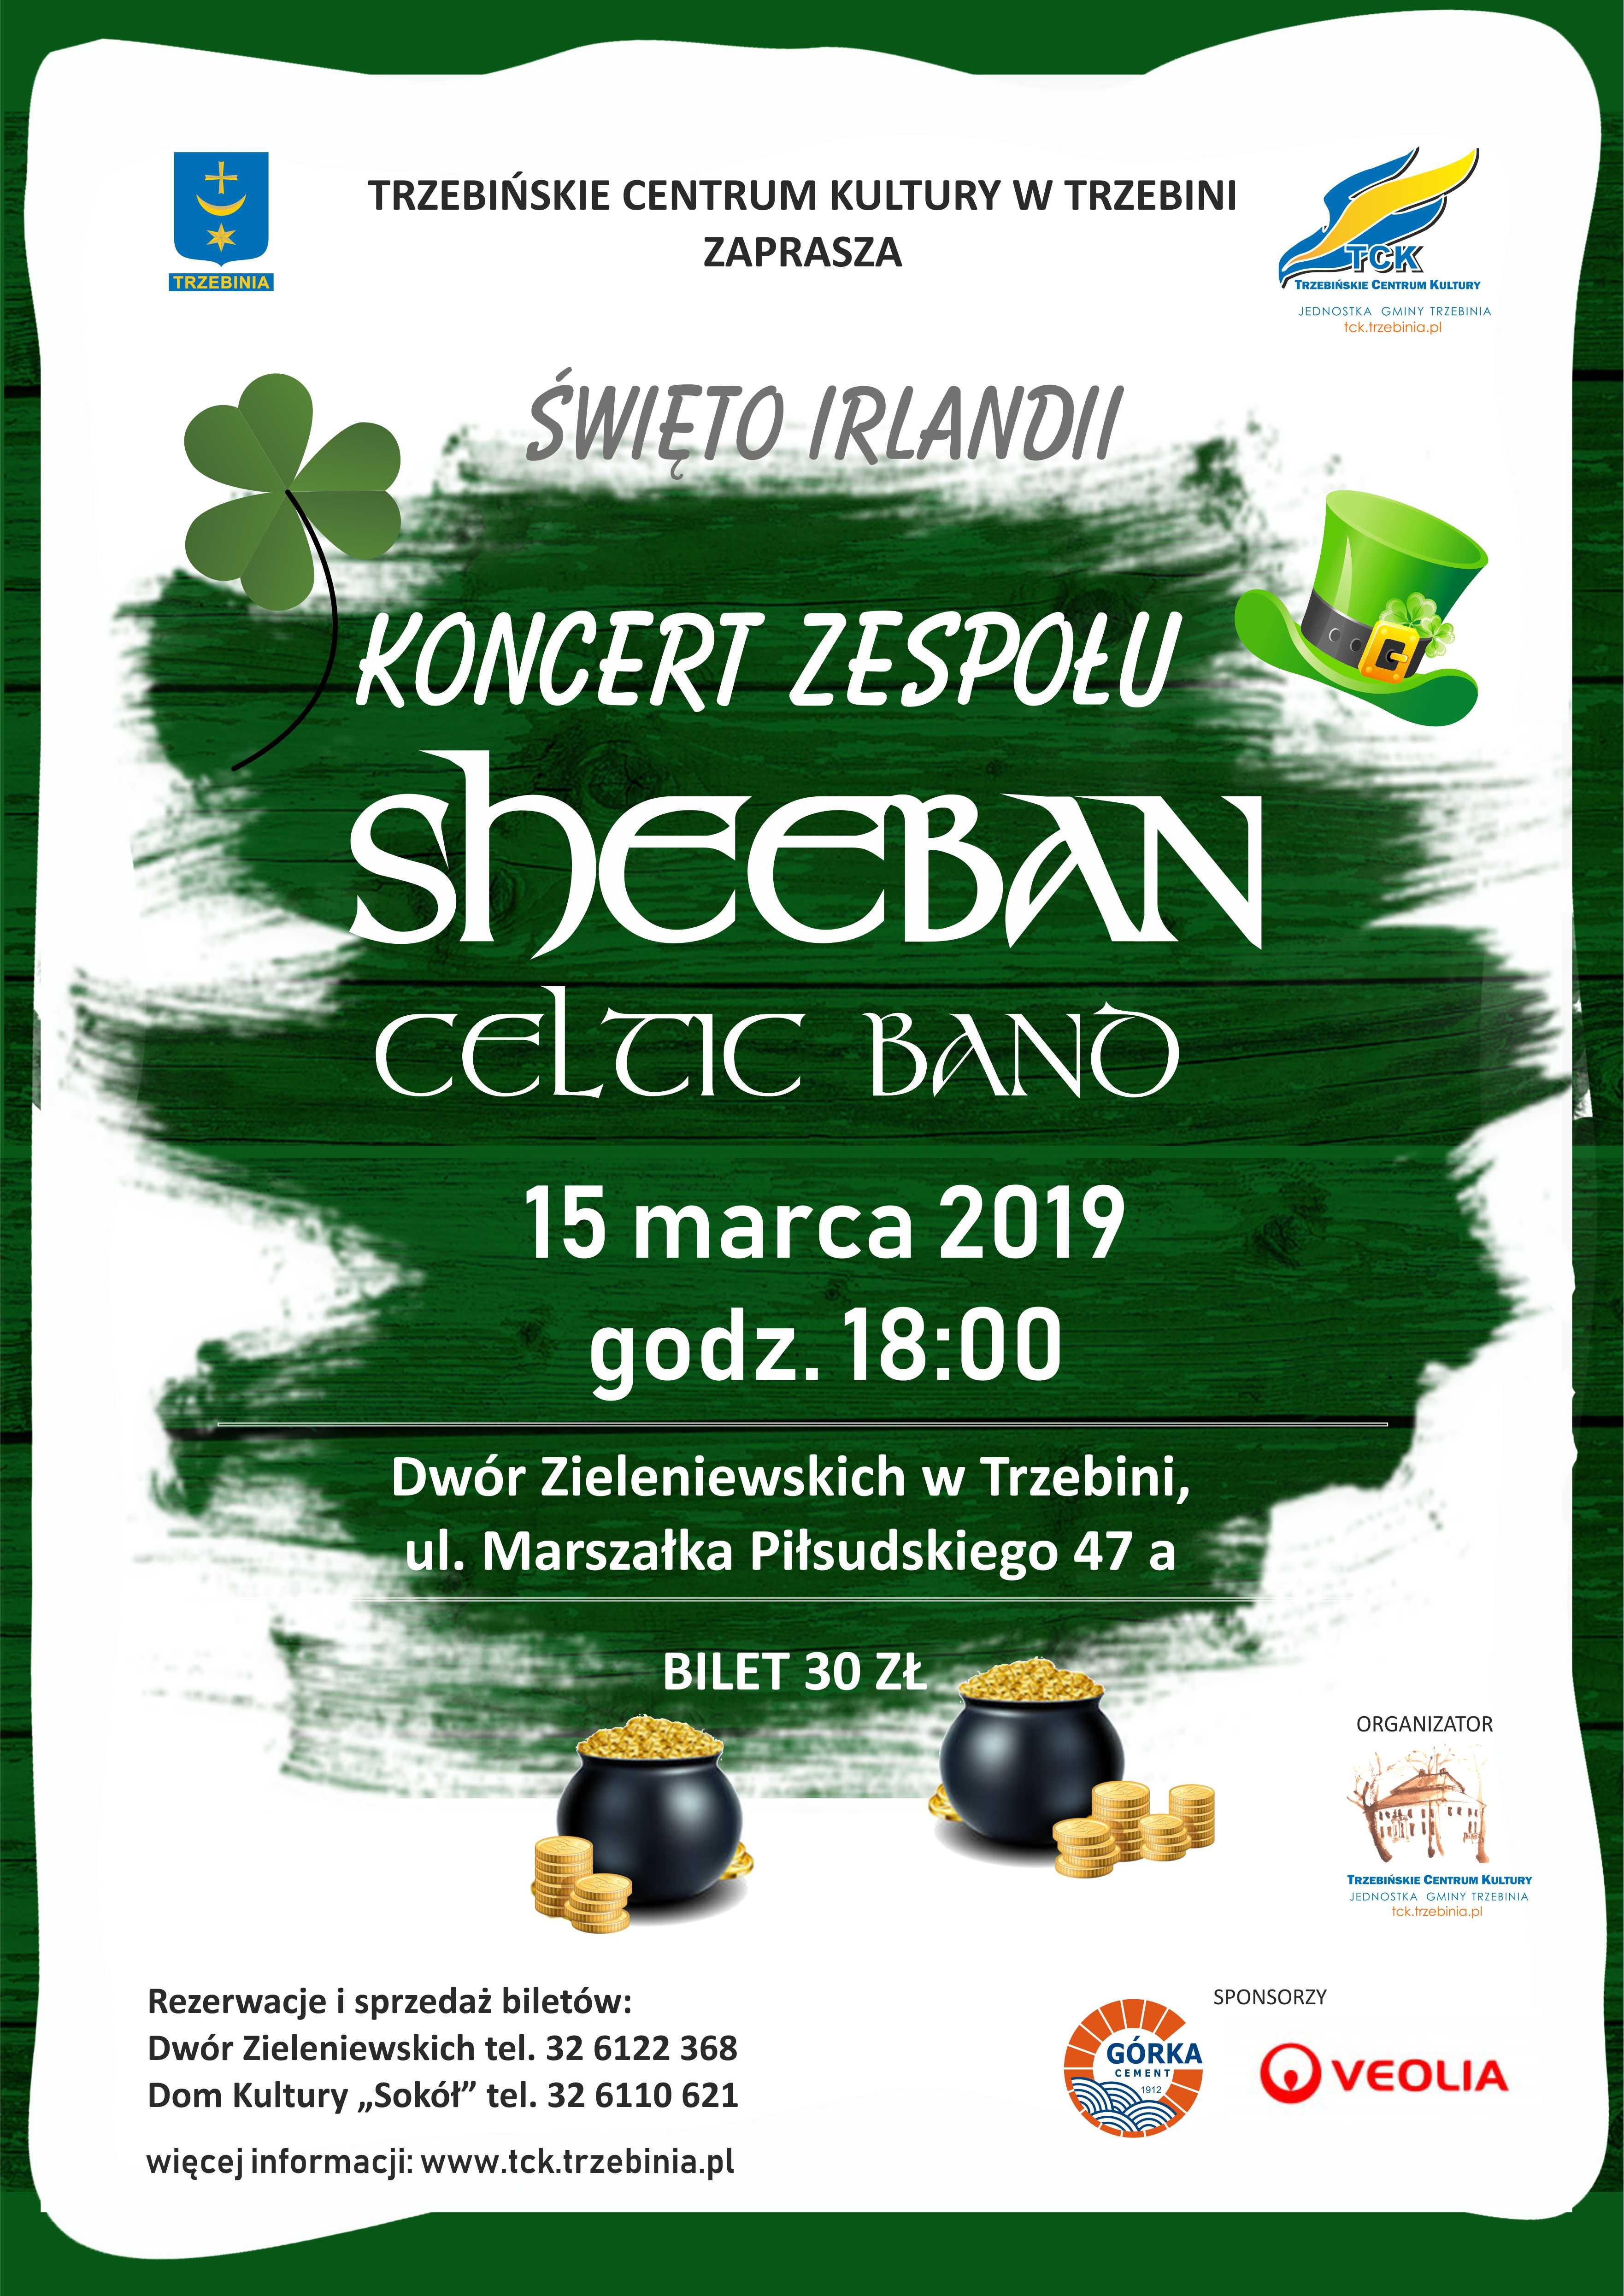 Święto Irlandii - koncert zespołu Sheeban Celtic Band